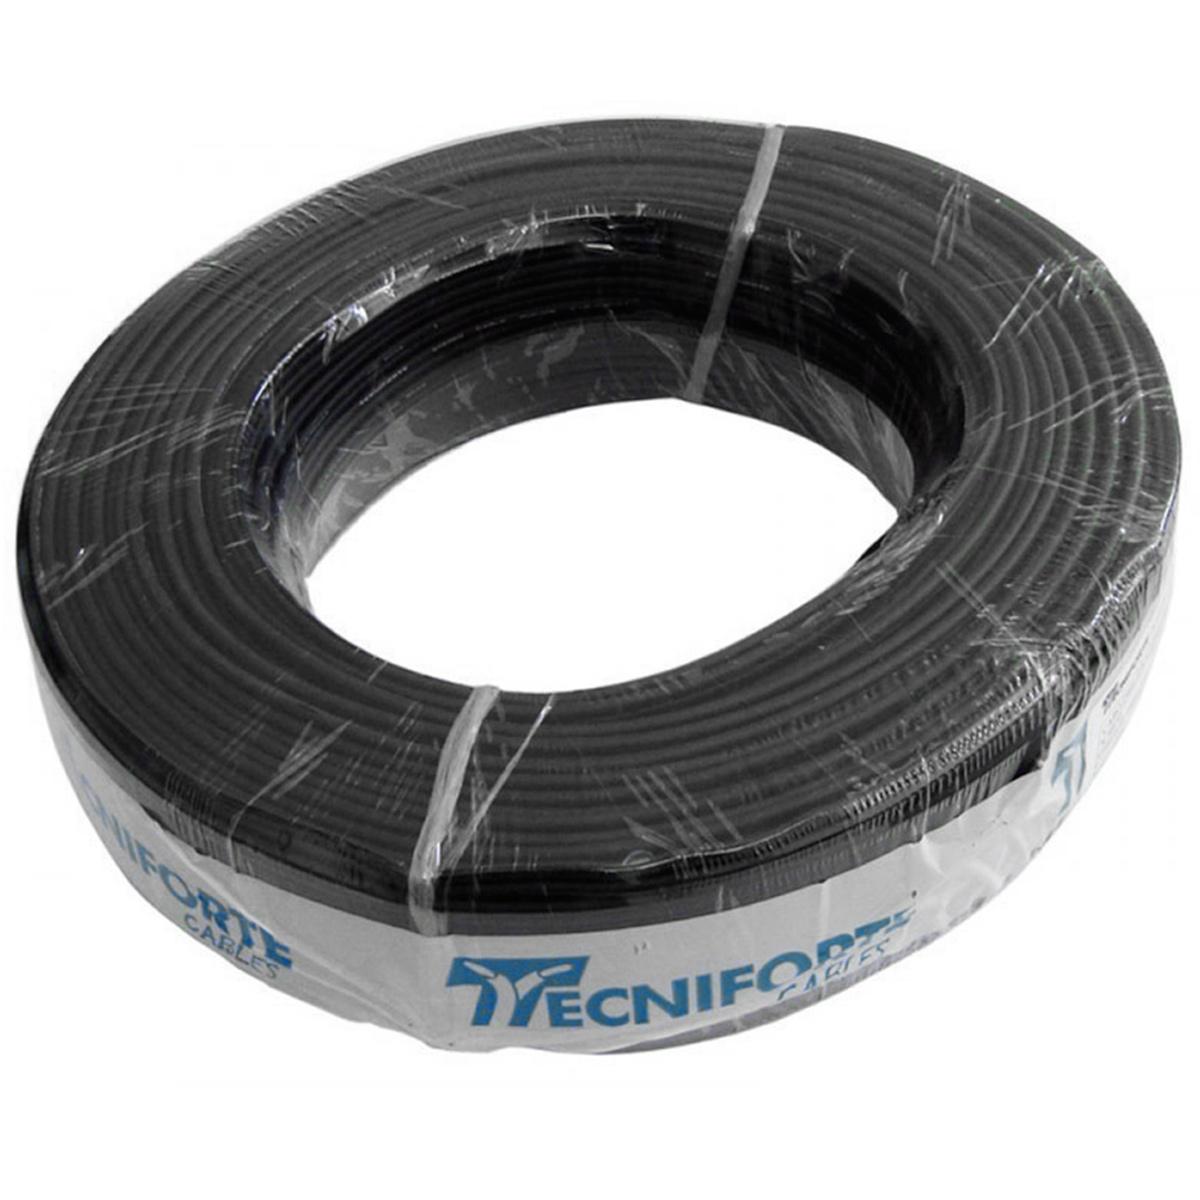 Cabo Emborrachado Paralelo PP 2x2,5mm (Rolo de 100 Metros) p/ Caixas de Som - Tecniforte